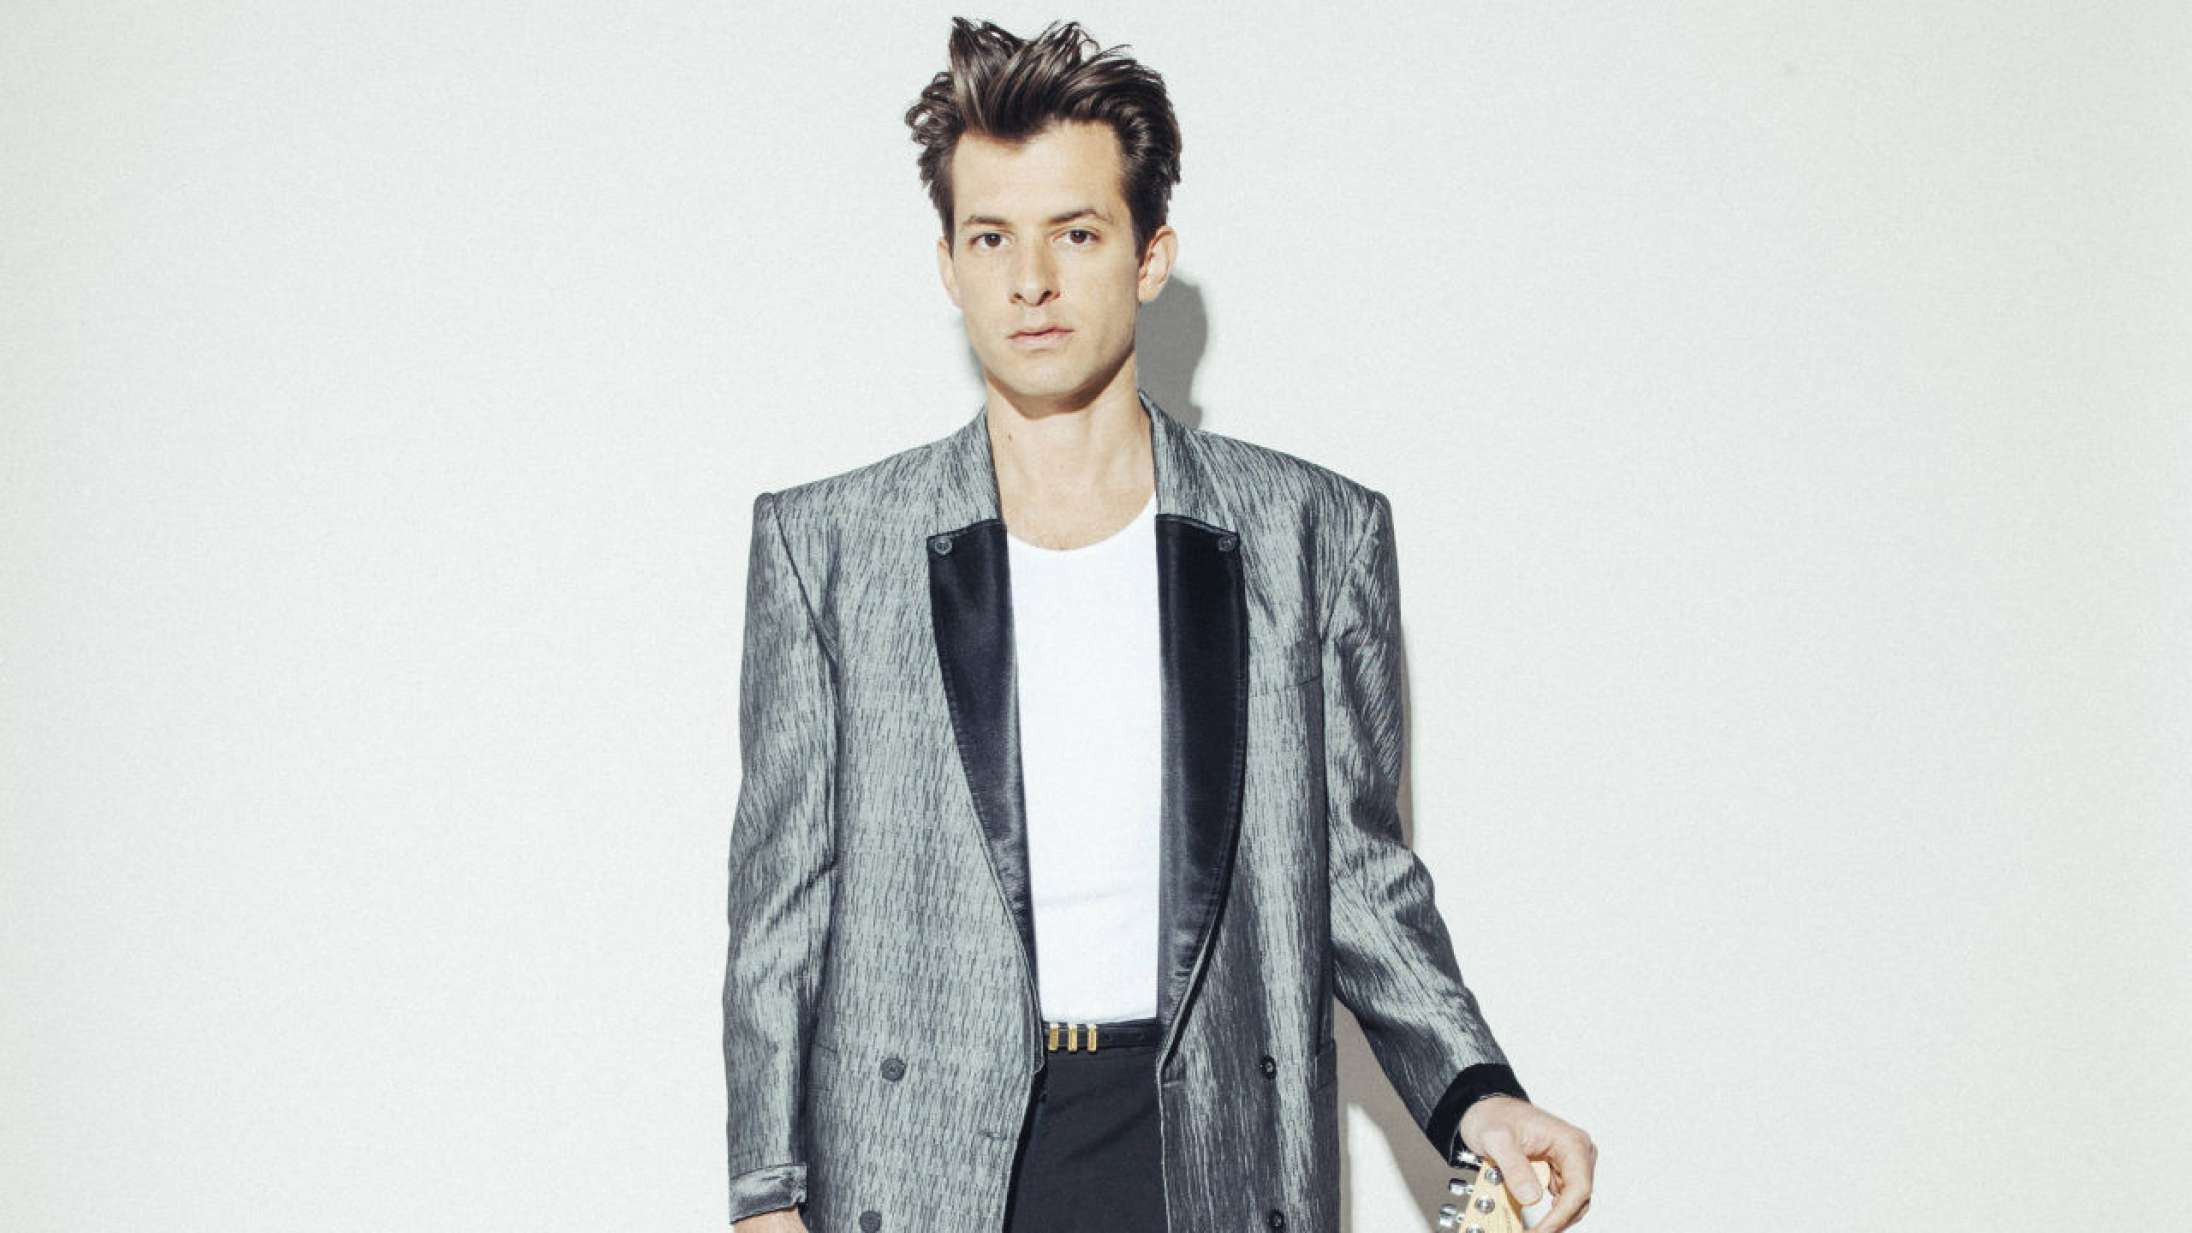 Top Tracks: Hør ugens 10 bedste nye sange – fra Katy Perry og Mark Ronson til Whitney og Sleater-Kinney